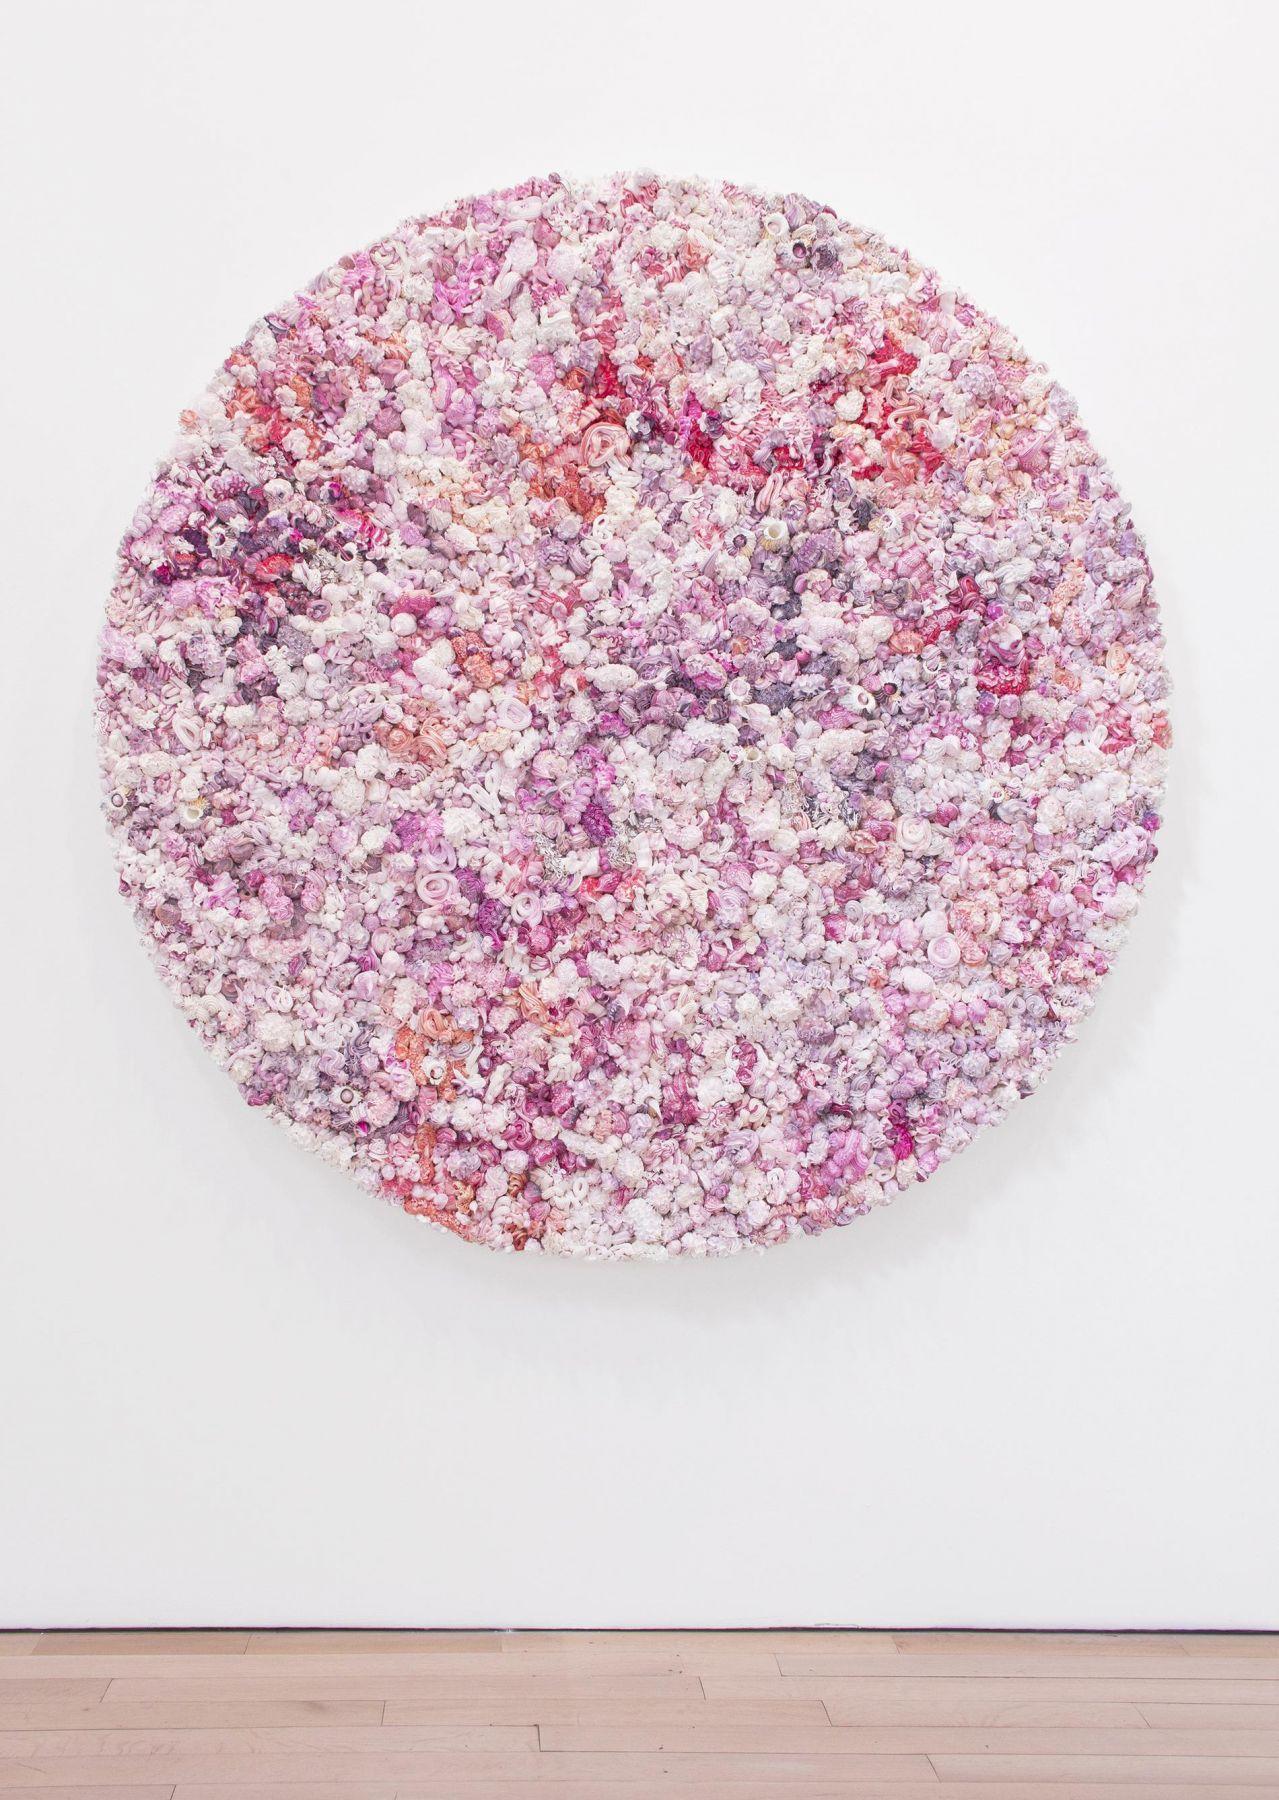 , Under Heaven -- 2808TR1601,2016,Oil on canvas, aluminum,70 3/4 in. (diameter) x 5 1/2 in.